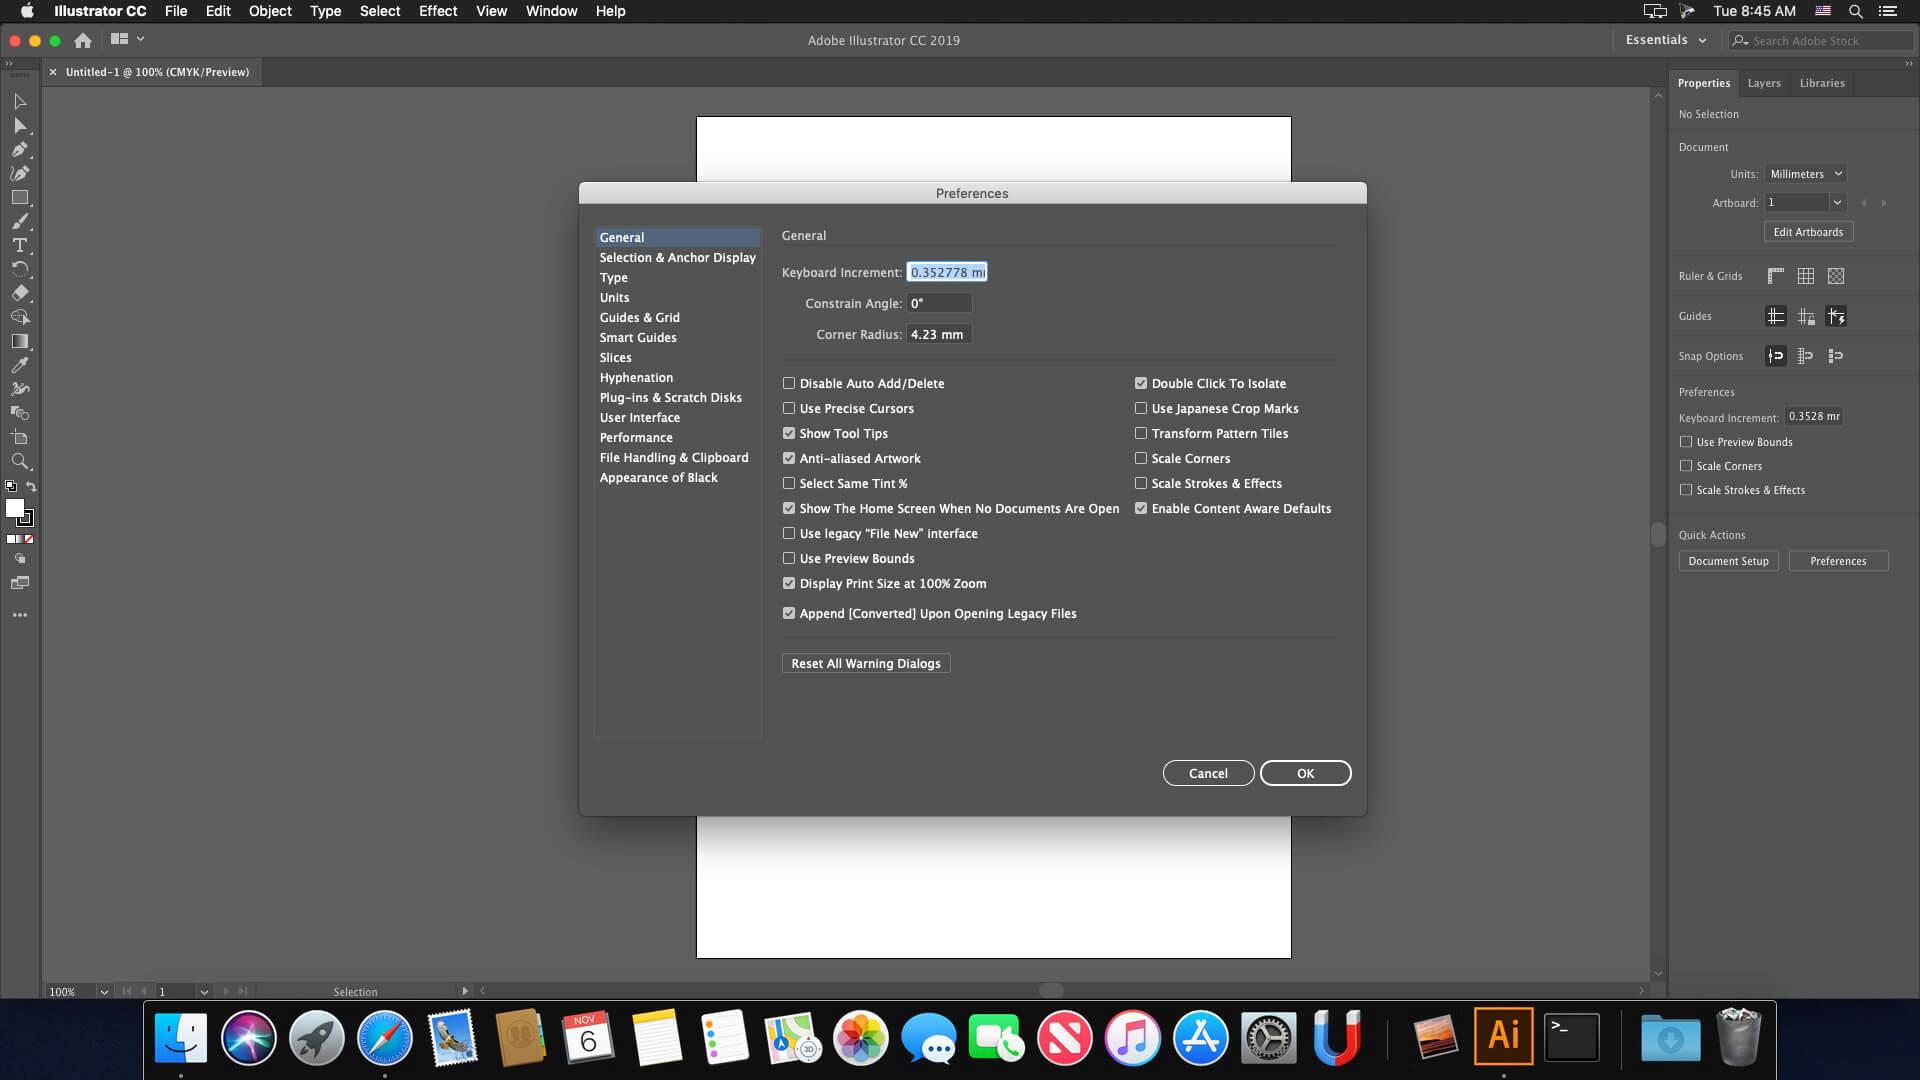 Adobe Illustrator CC 2019 v23 0 6 download | macOS